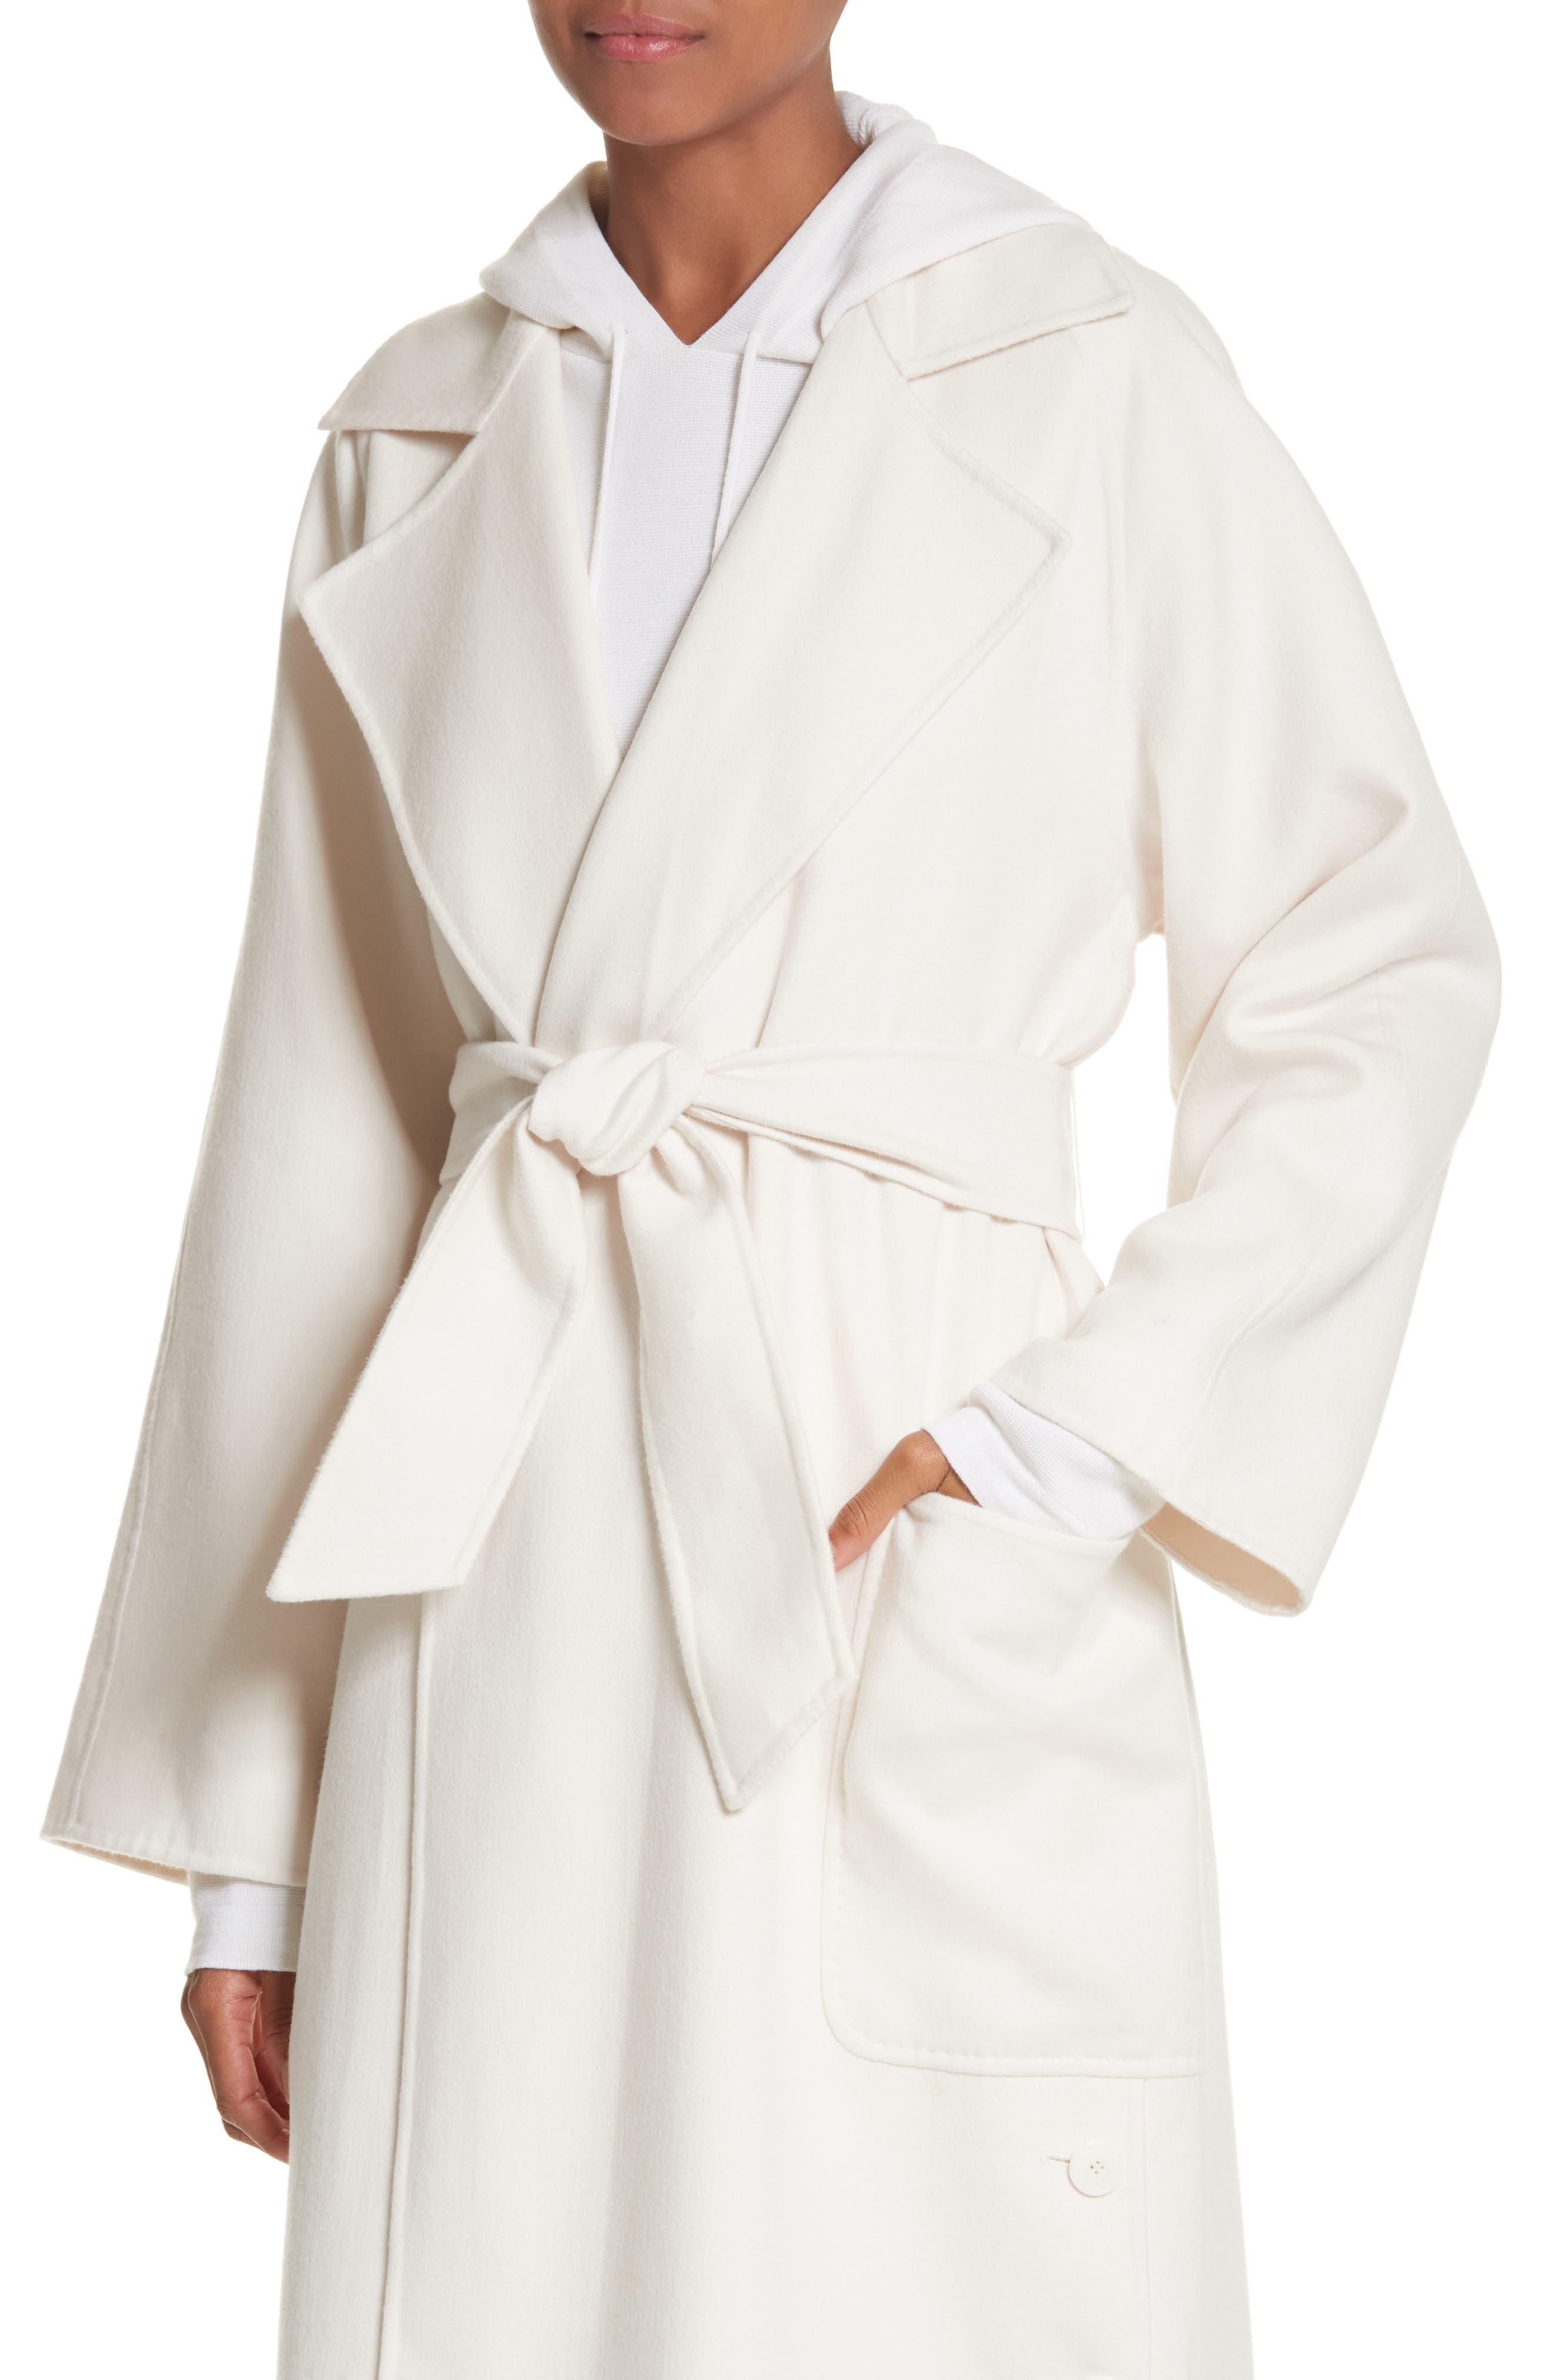 Alacre Wool & Cashmere Coat,                             Alternate thumbnail 4, color,                             110